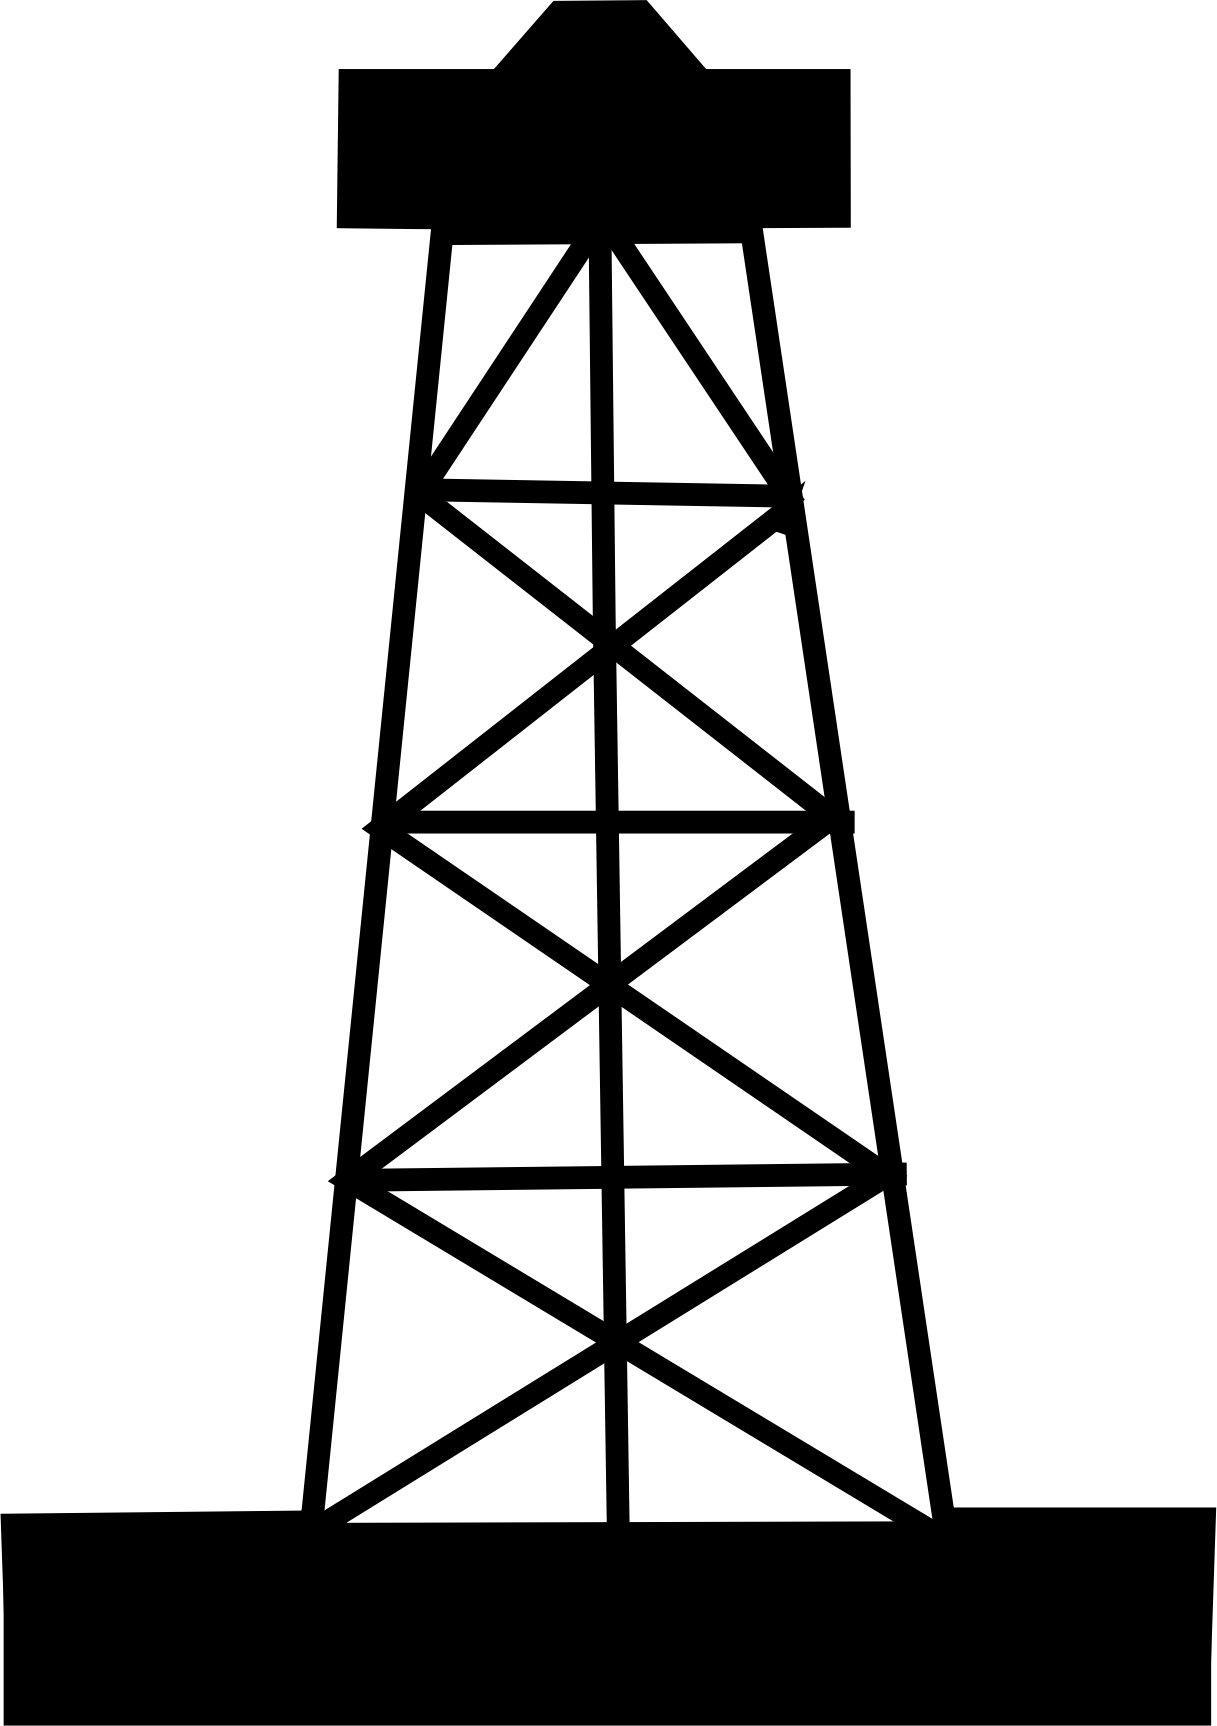 Oil Field Clipart